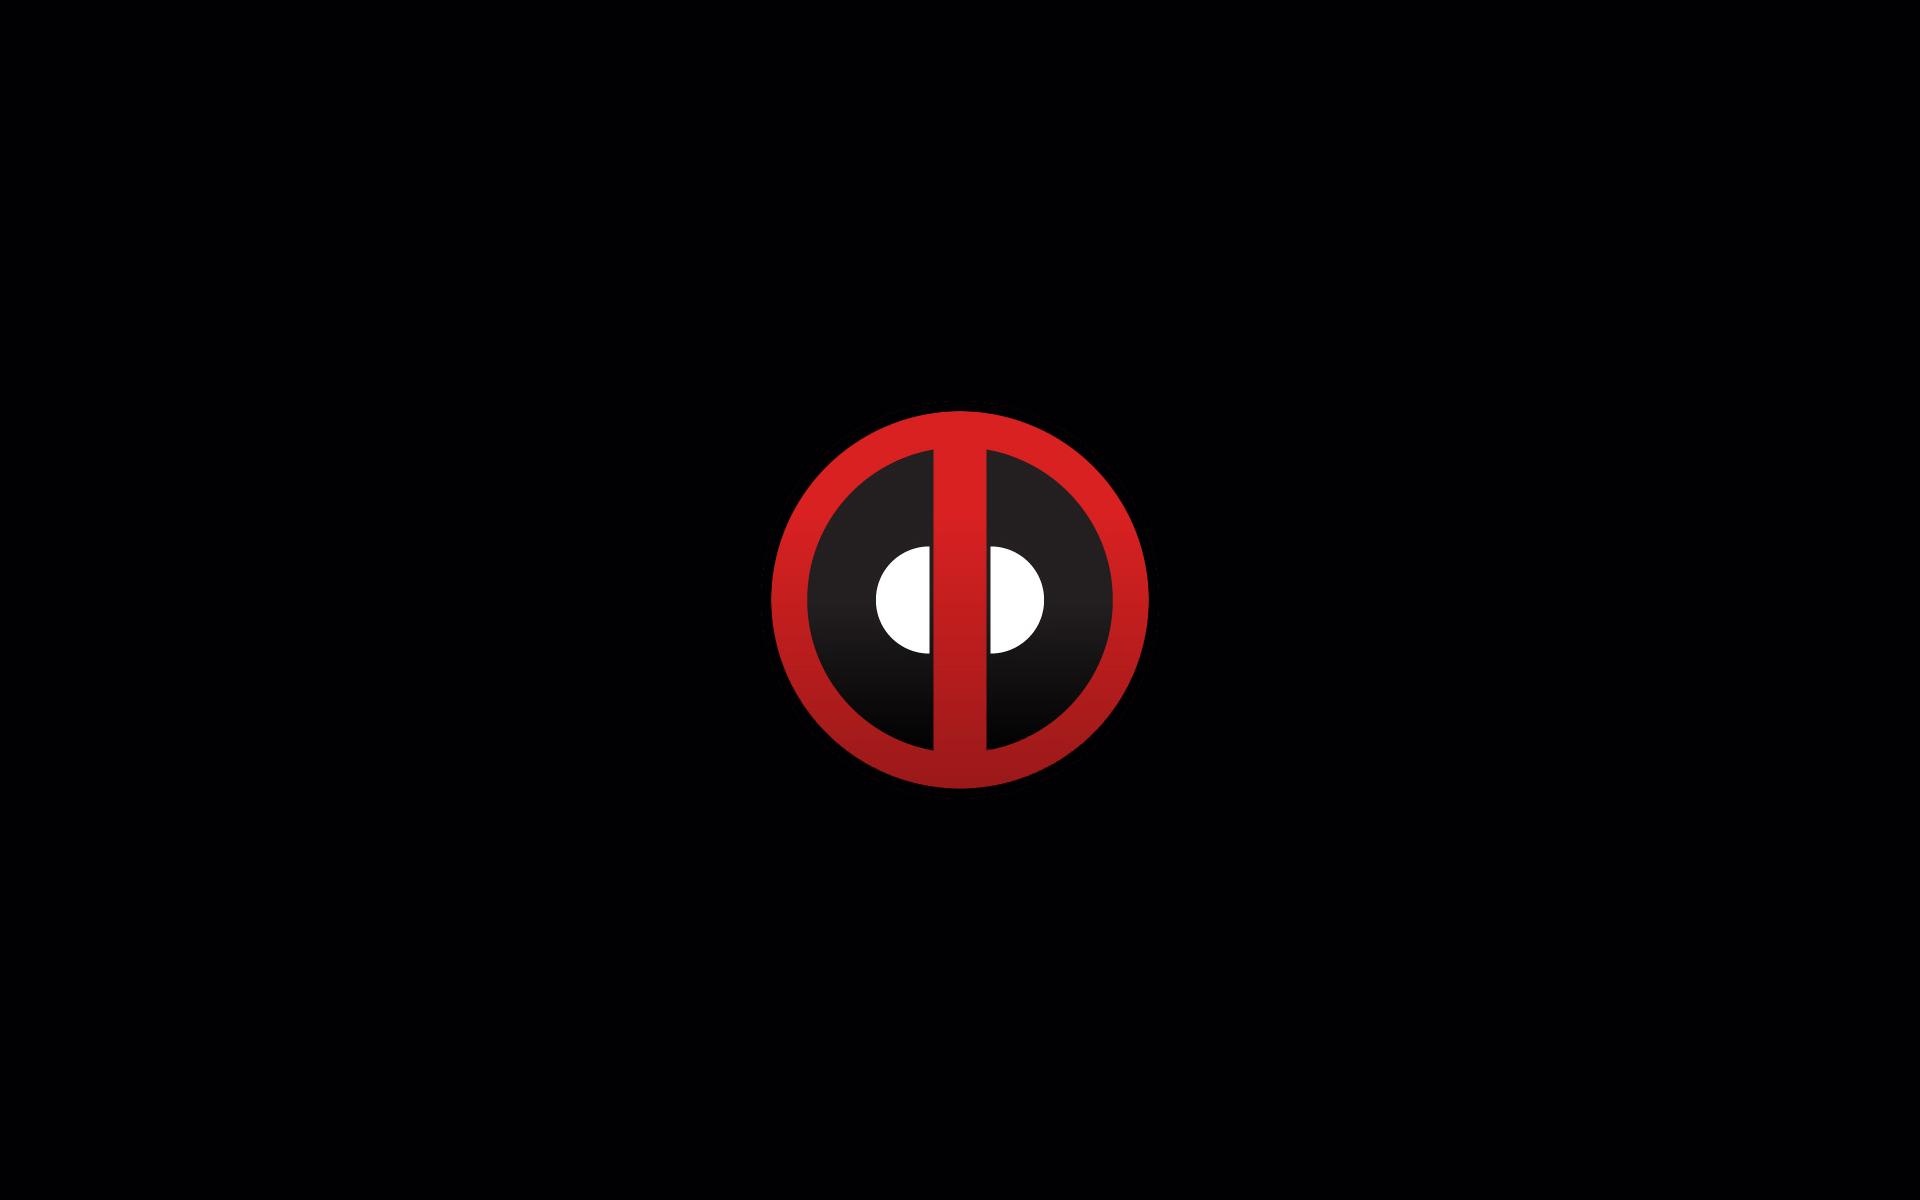 Deadpool Logo Wallpapers Phone - Scerbos com